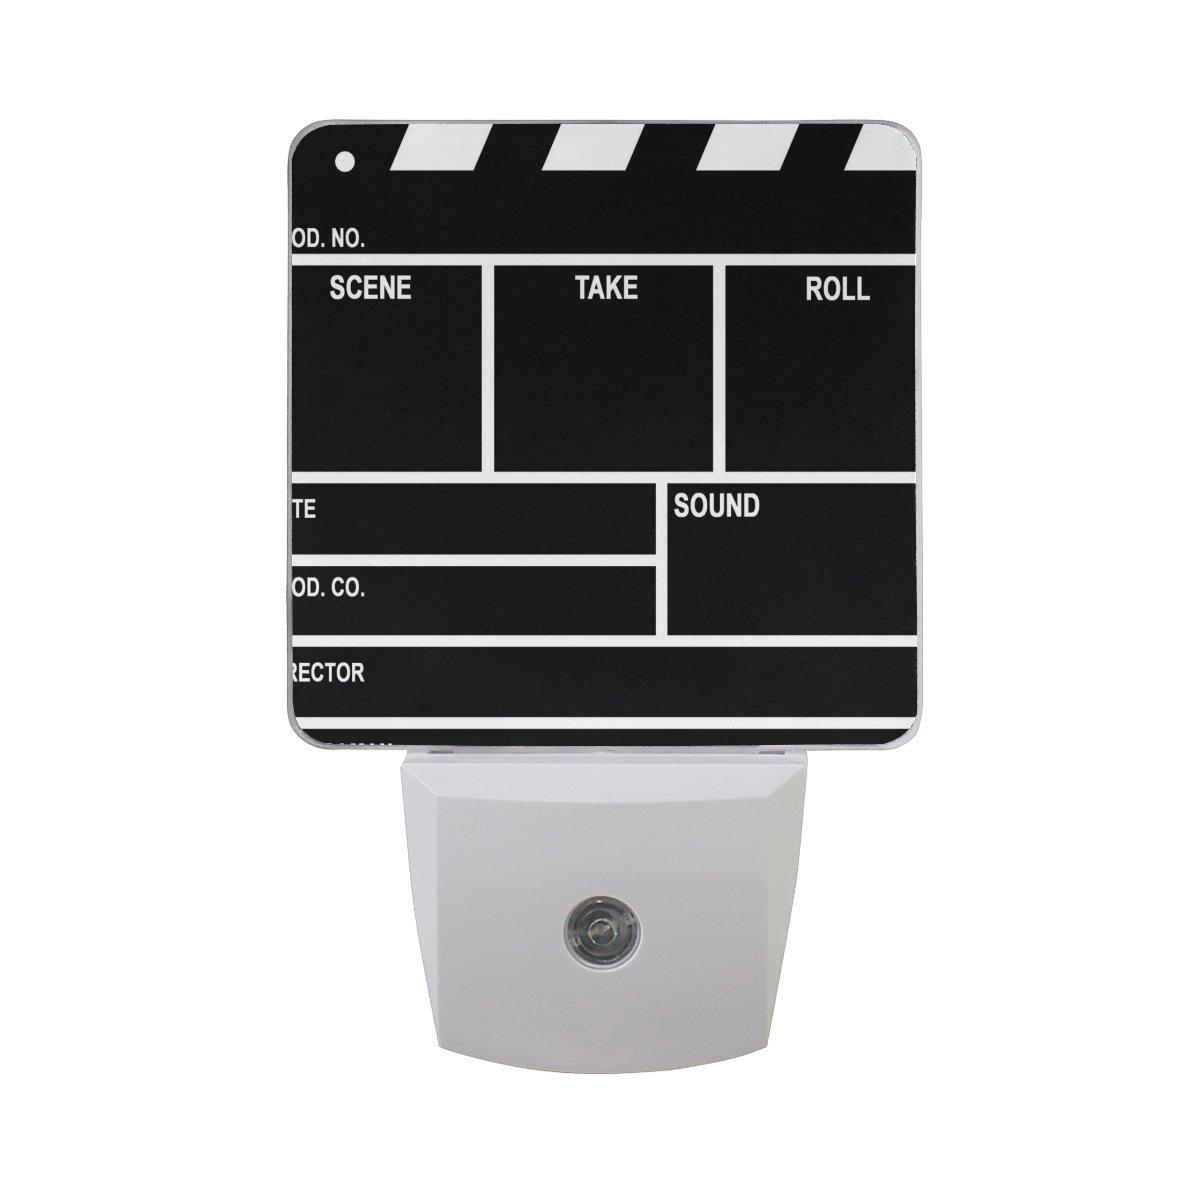 ALAZA Film Clap Board Movie LED Night Light Dusk to Dawn Sensor Plug in Night Home Decor Desk Lamp for Adult